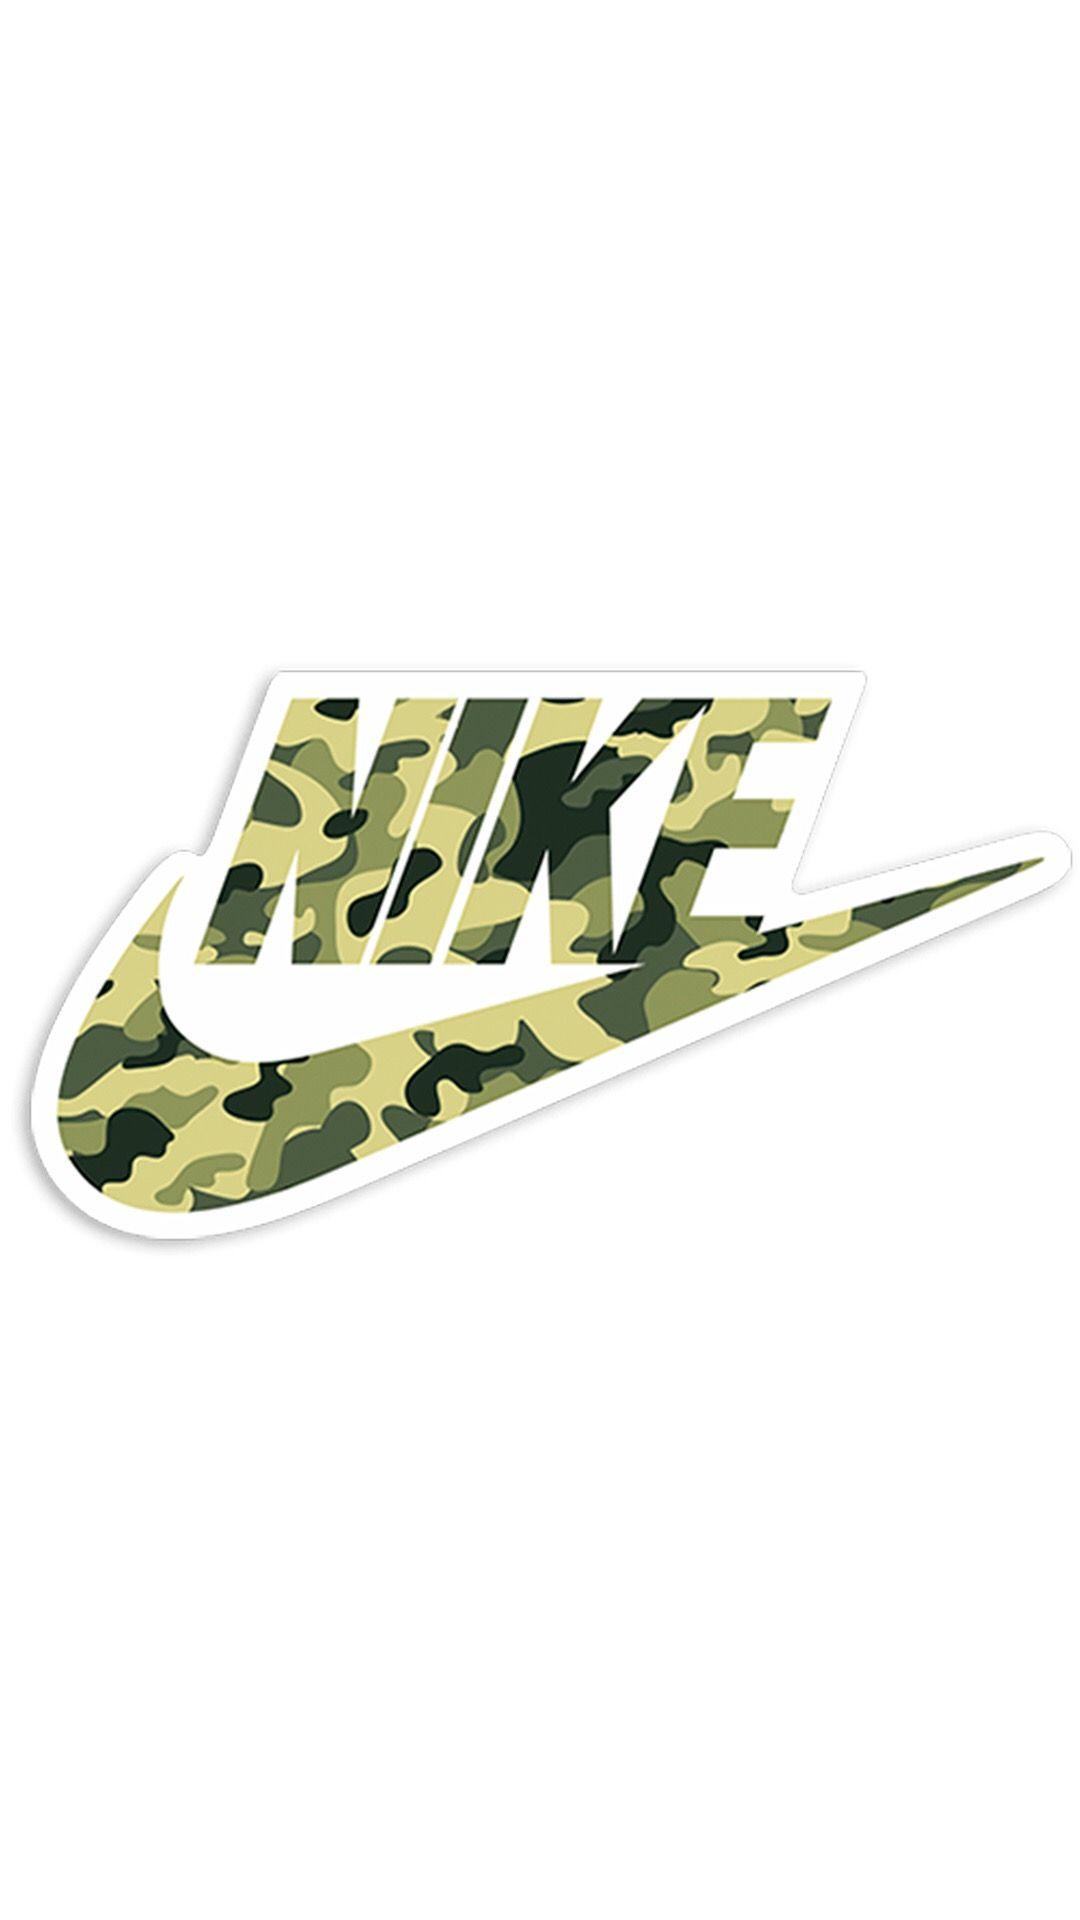 Asker desenli nike wallpaper   Nike wallpaper, Nike logo ...